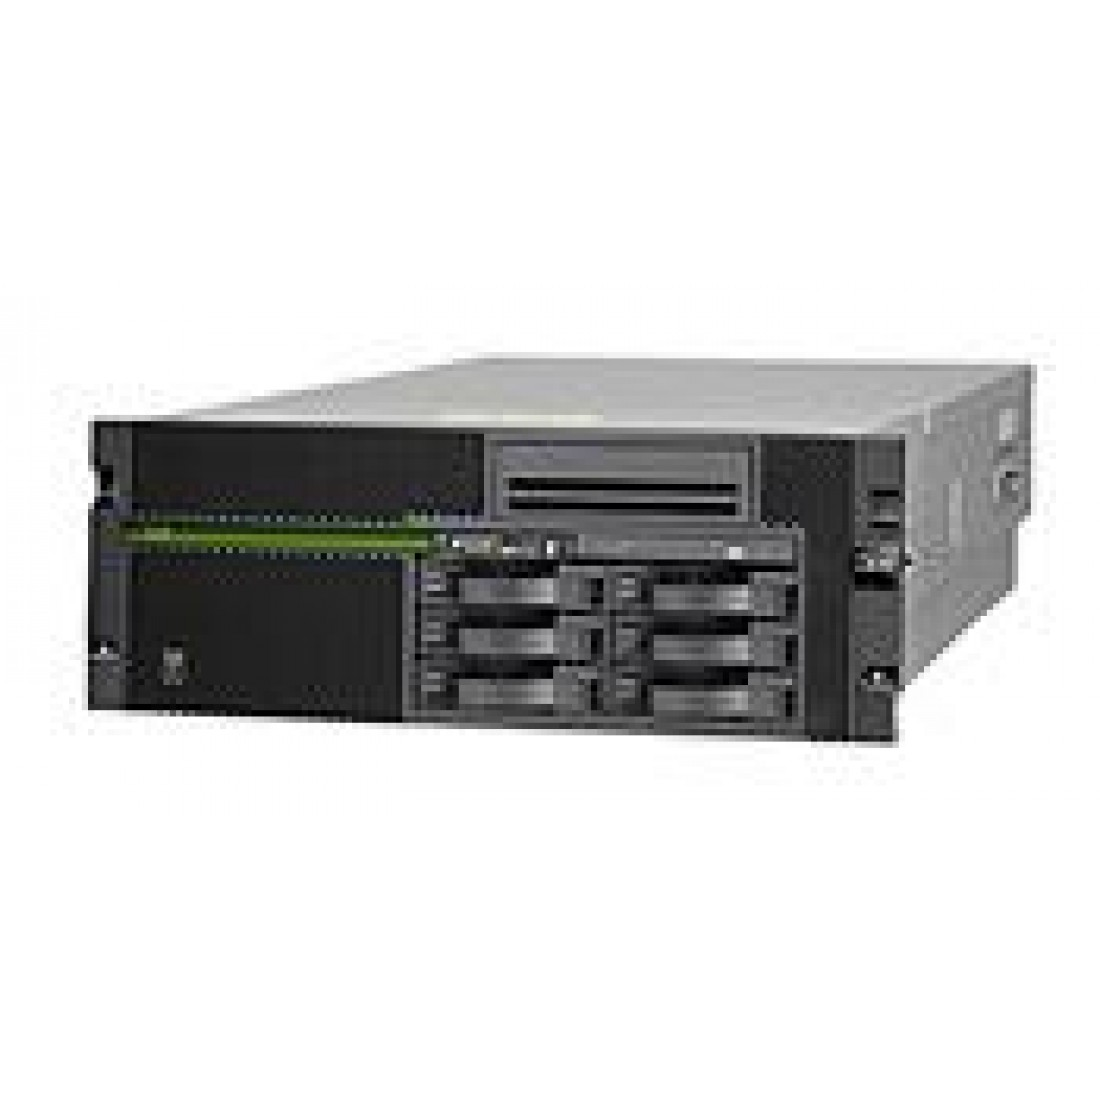 870e134cb ibm-i-model-9408-m25-1-core-4300-cpw-power6-model-520-13516-1100x1100.JPG